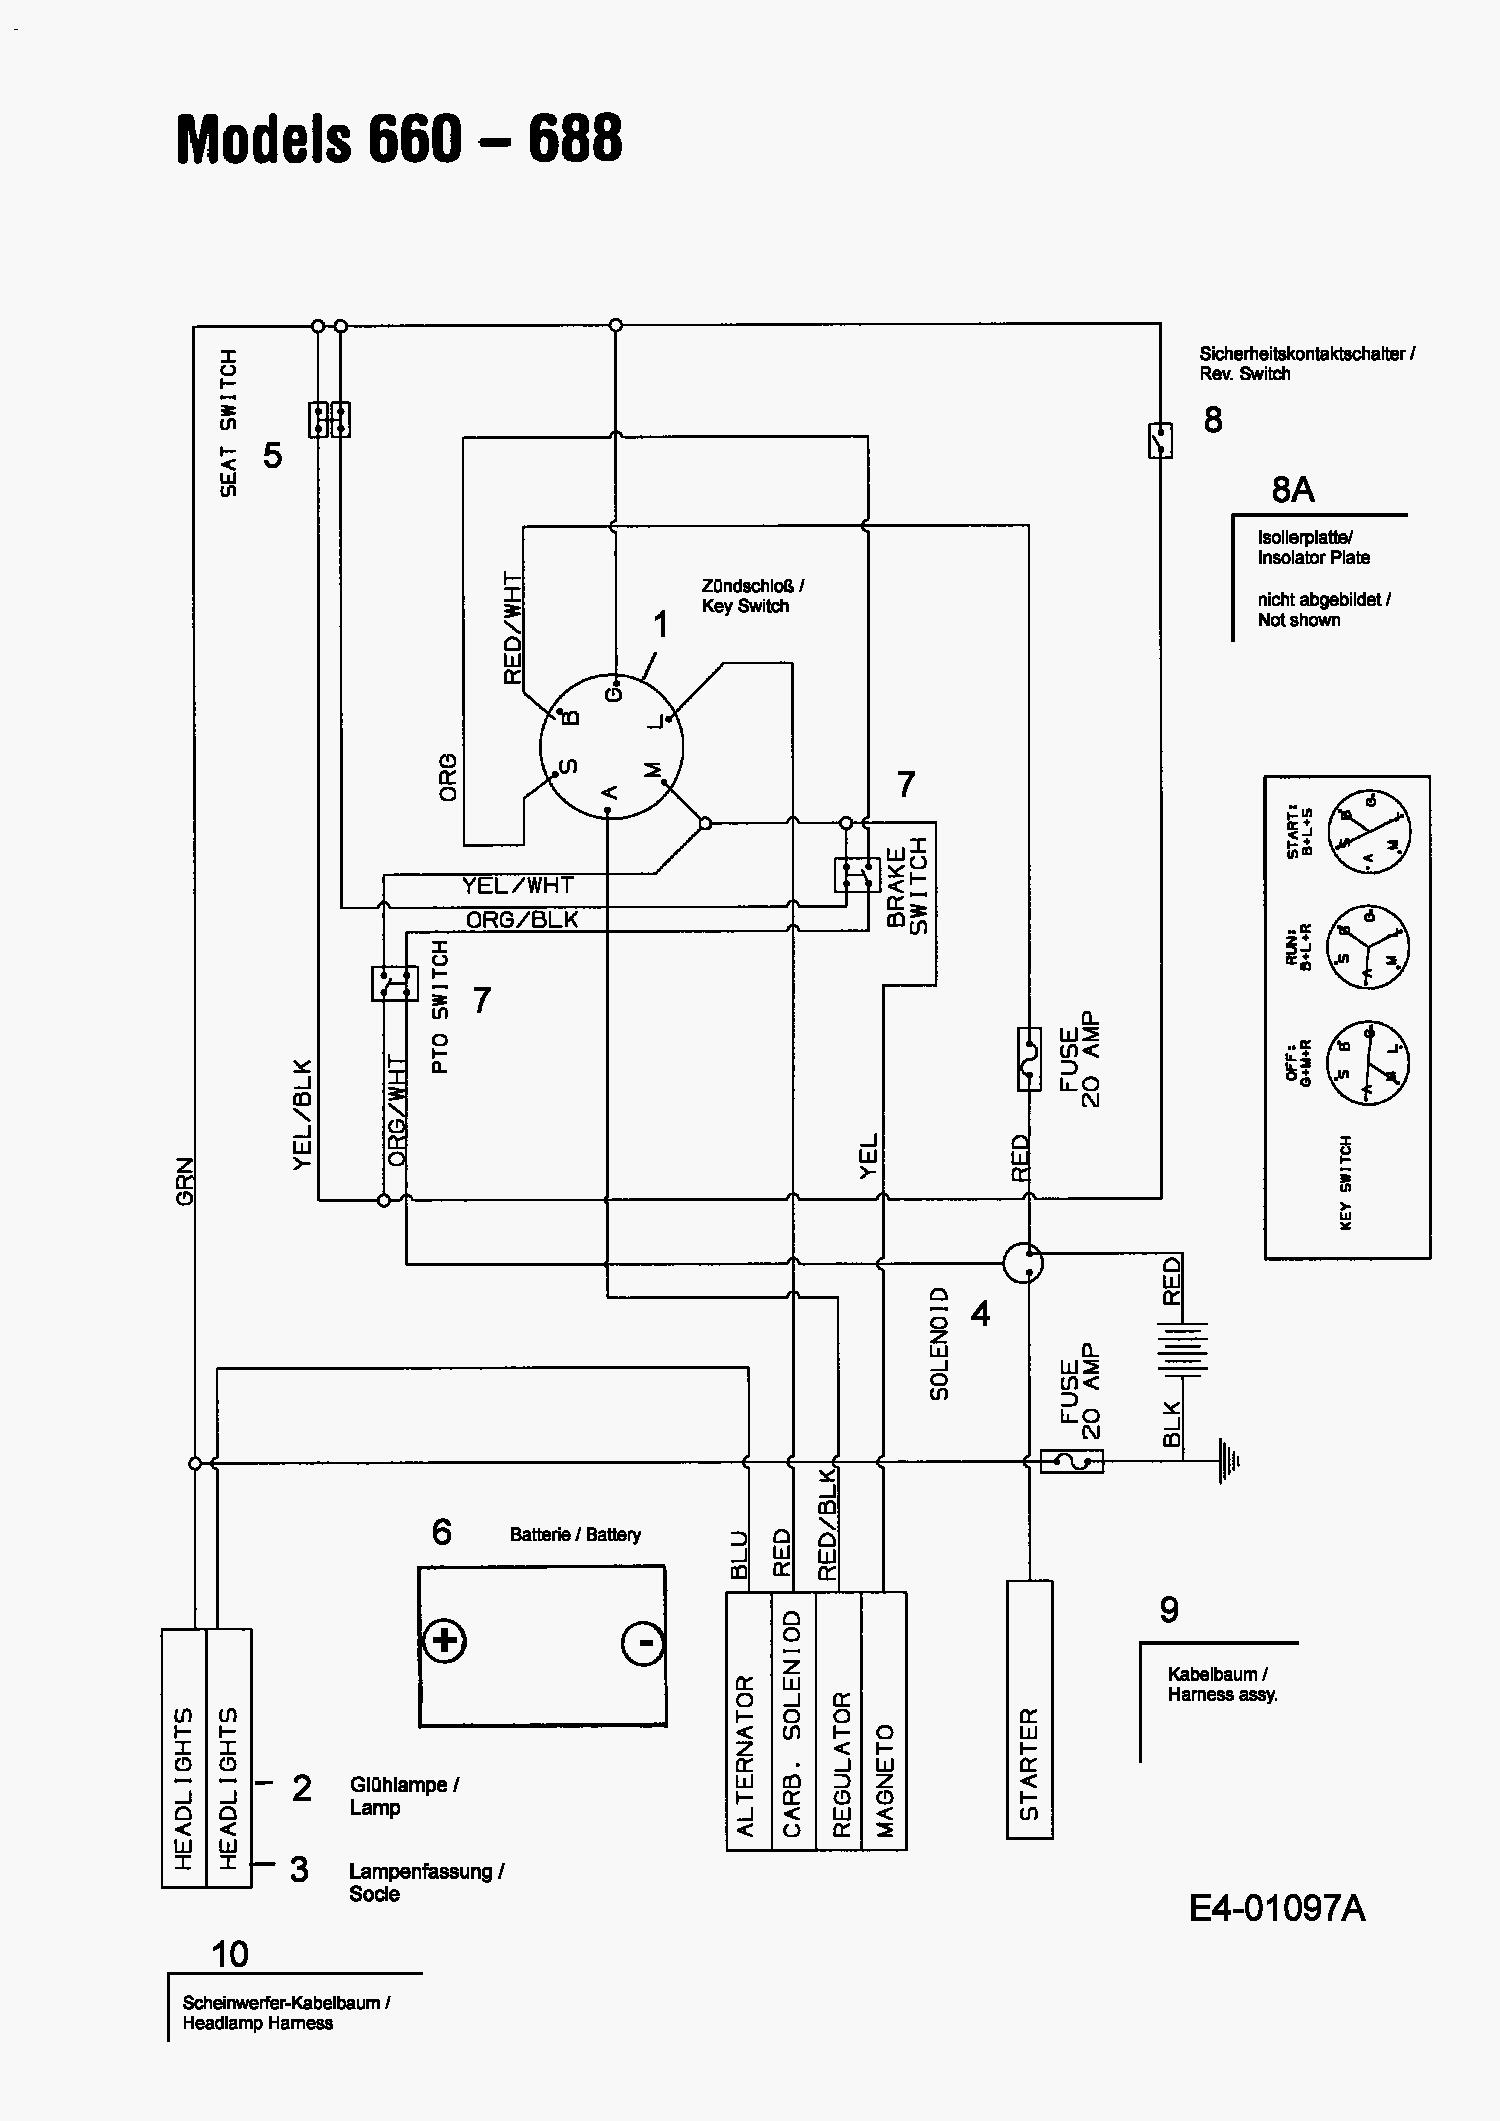 Toro 270 Wiring Diagram | Wiring Diagram Database A Toro Ignition Switch Wiring Diagram on